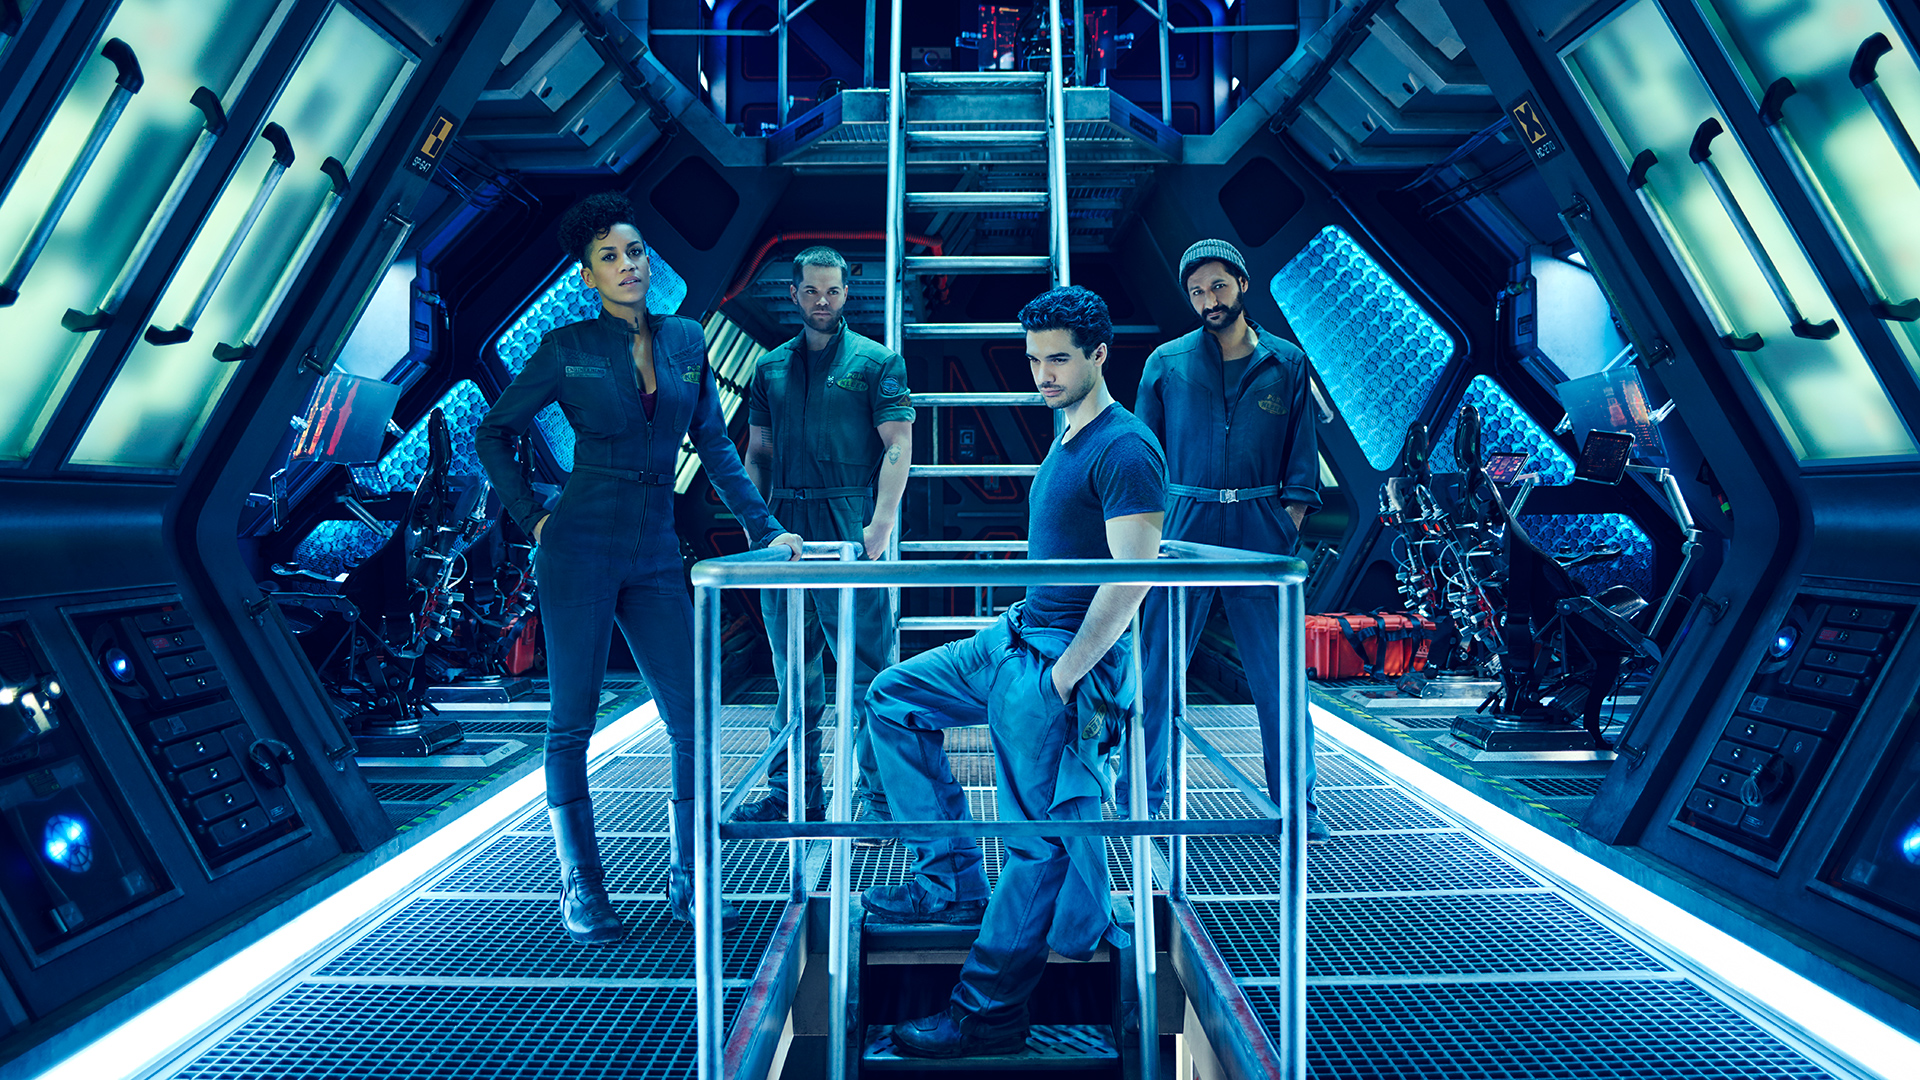 Seriálové okénko: The Expanse - nový král mezi scifi seriály? 13172